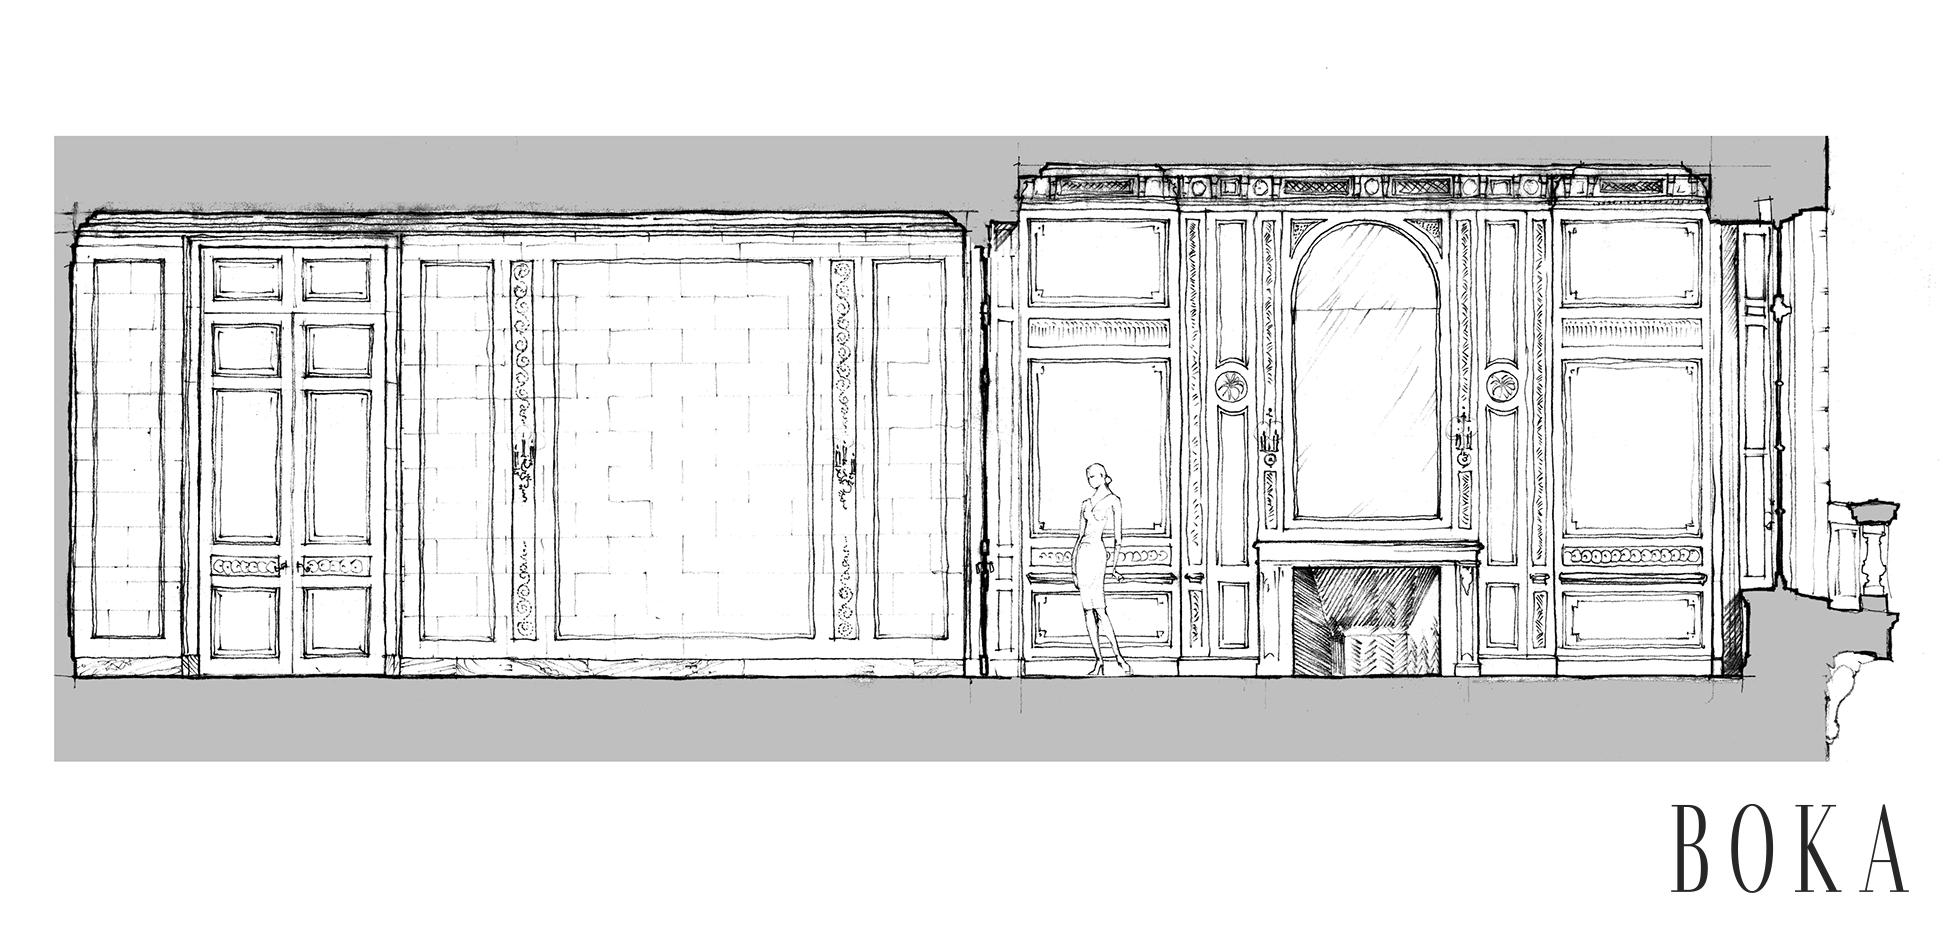 5 Upper Eastside Townhouse Stair Hall